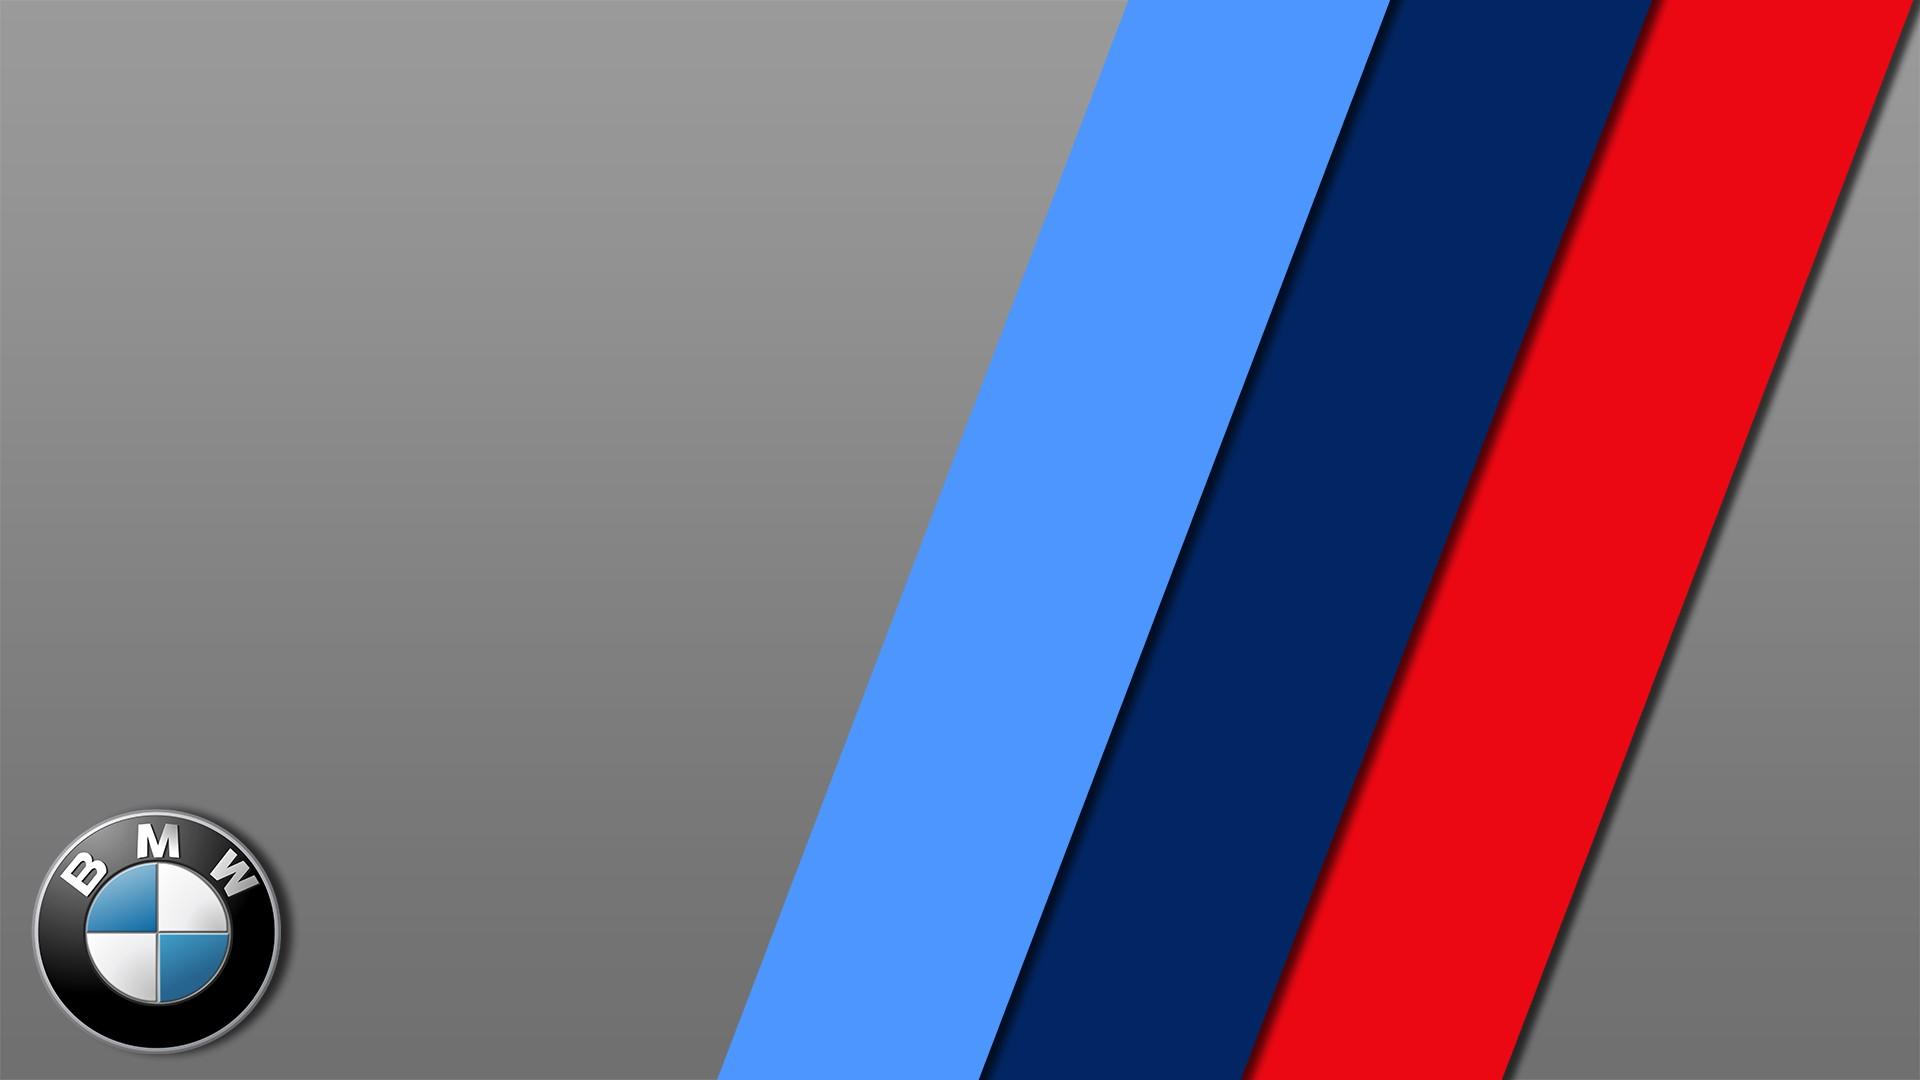 Download BMW Logo Background 1920x1080